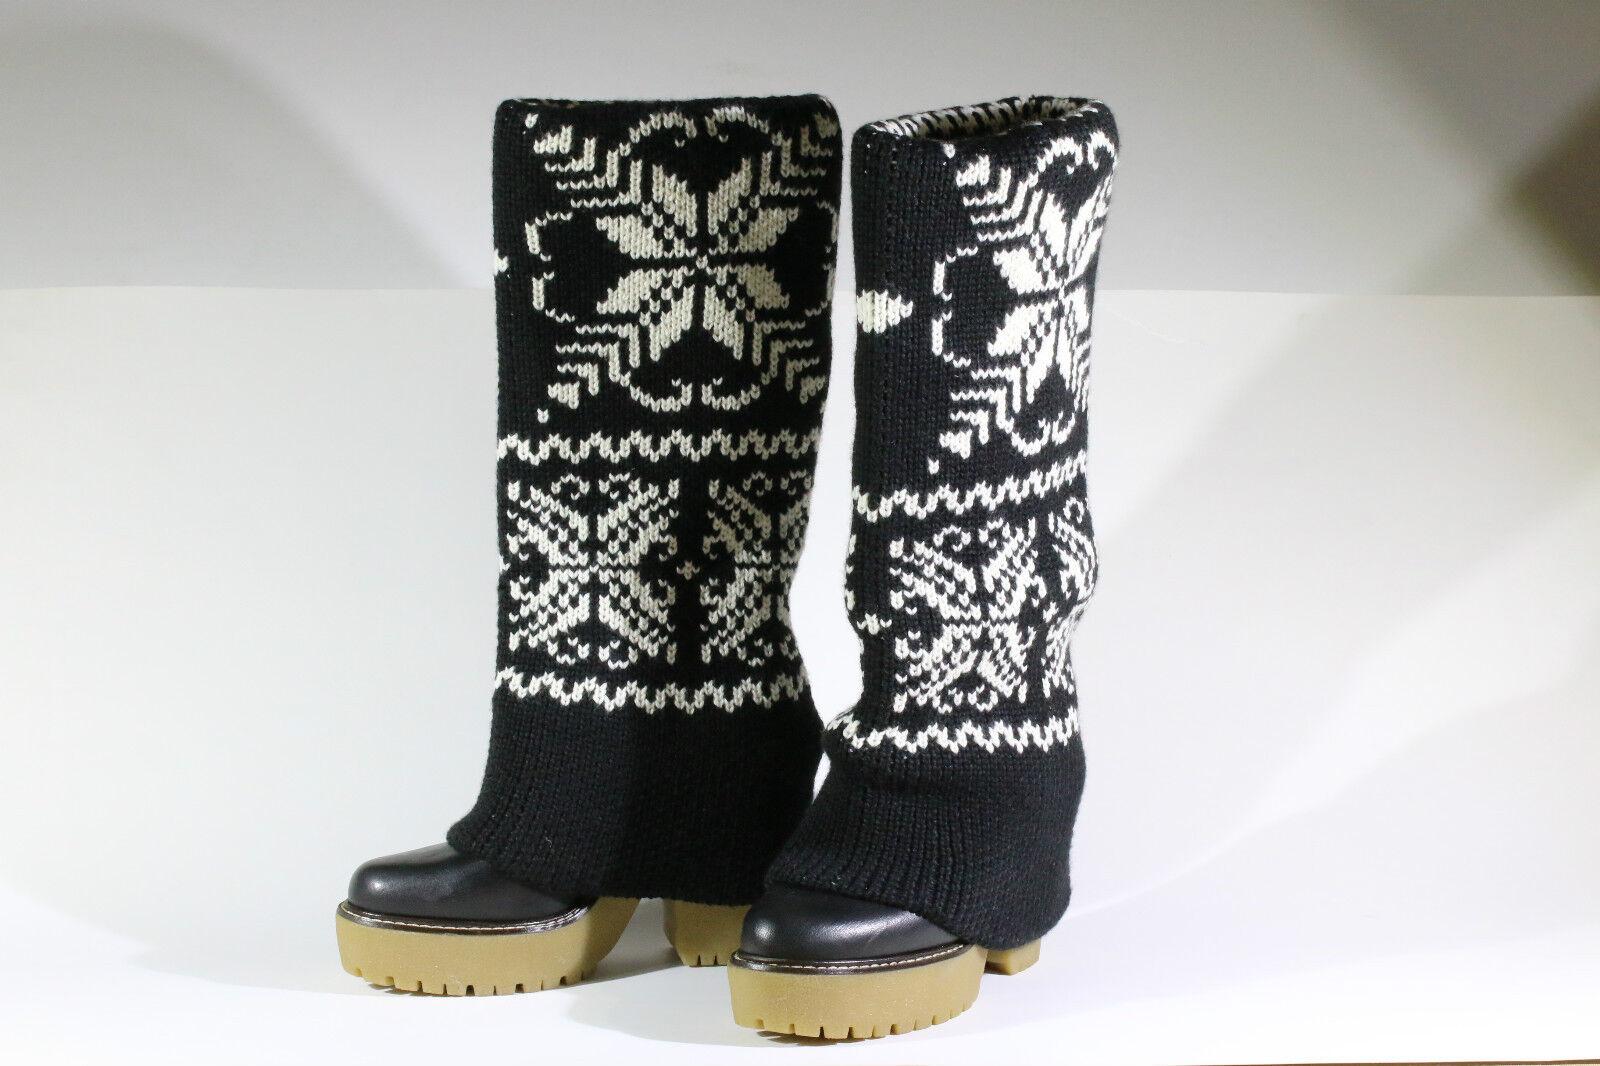 D&G Dolche & Gabbana Stiefel Boots - AVS10101 ND3